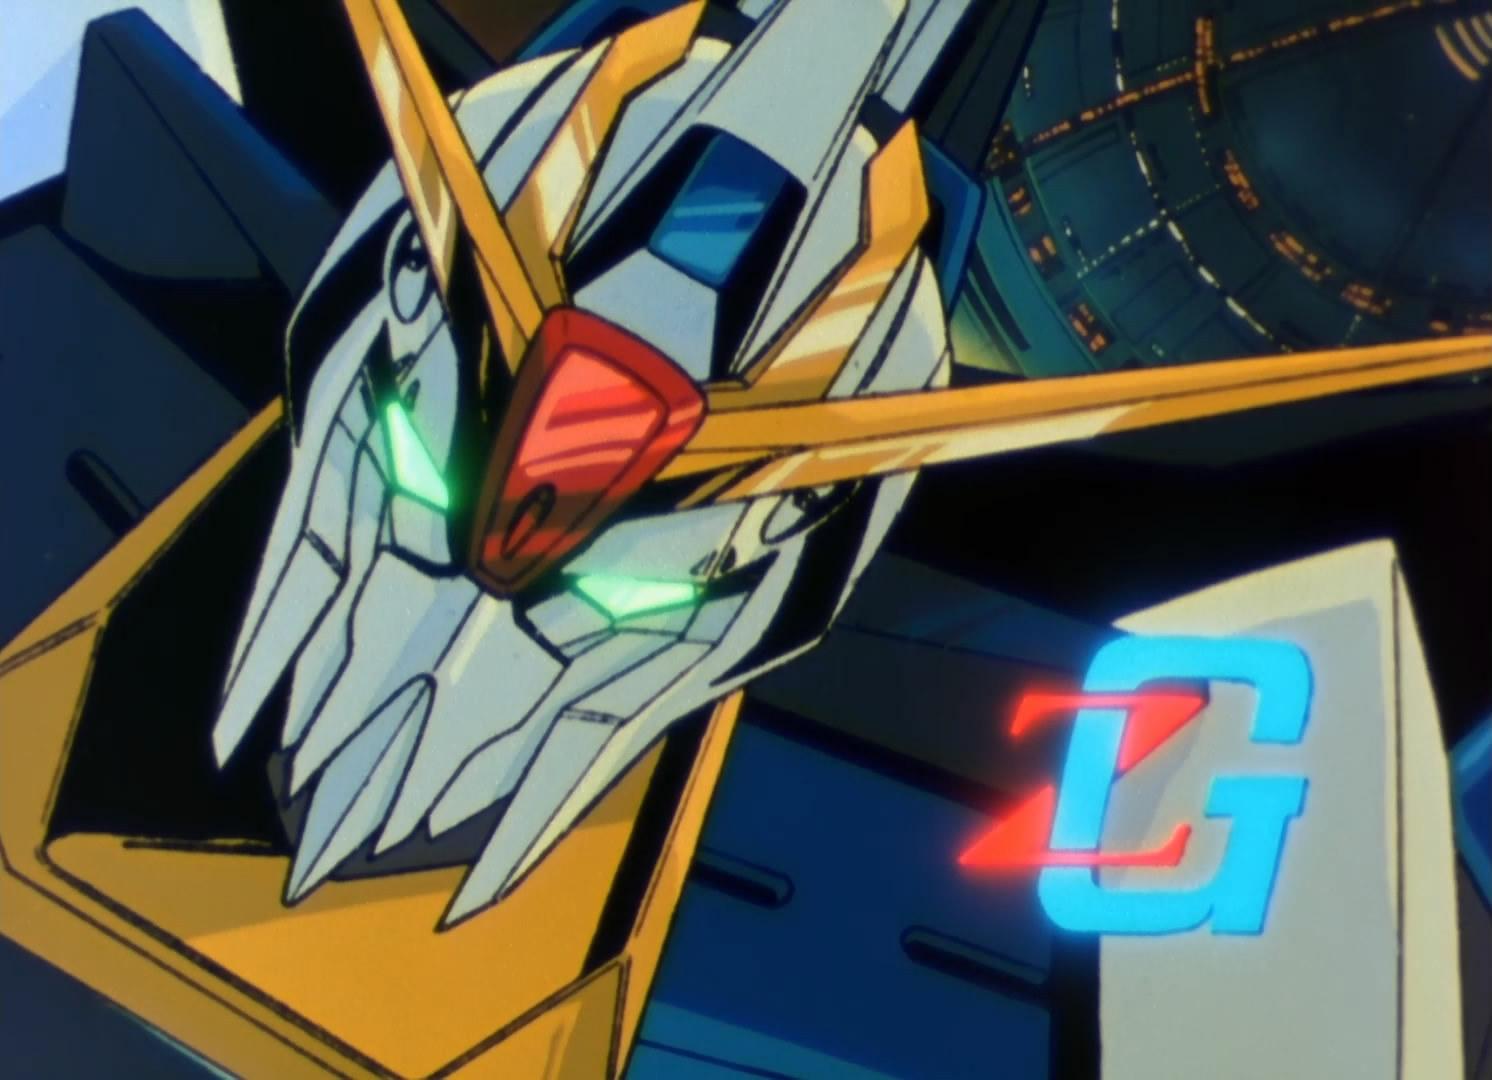 U.C.0086年,RMS-099/MSA-099 Rick Dias( Gundam)开发完毕。与此同时,作为开发商的A.E.公司与A.E.U.G.进一步加强合作,开展名为VMsAWrs(Variable Mobile-suit And Wave-rider system,战术可变MS与WR系统)的高性能次世代MS开发计划,而最为人熟知的名称应该是,『Zeta计划』。面对需求方这个高要求,A.